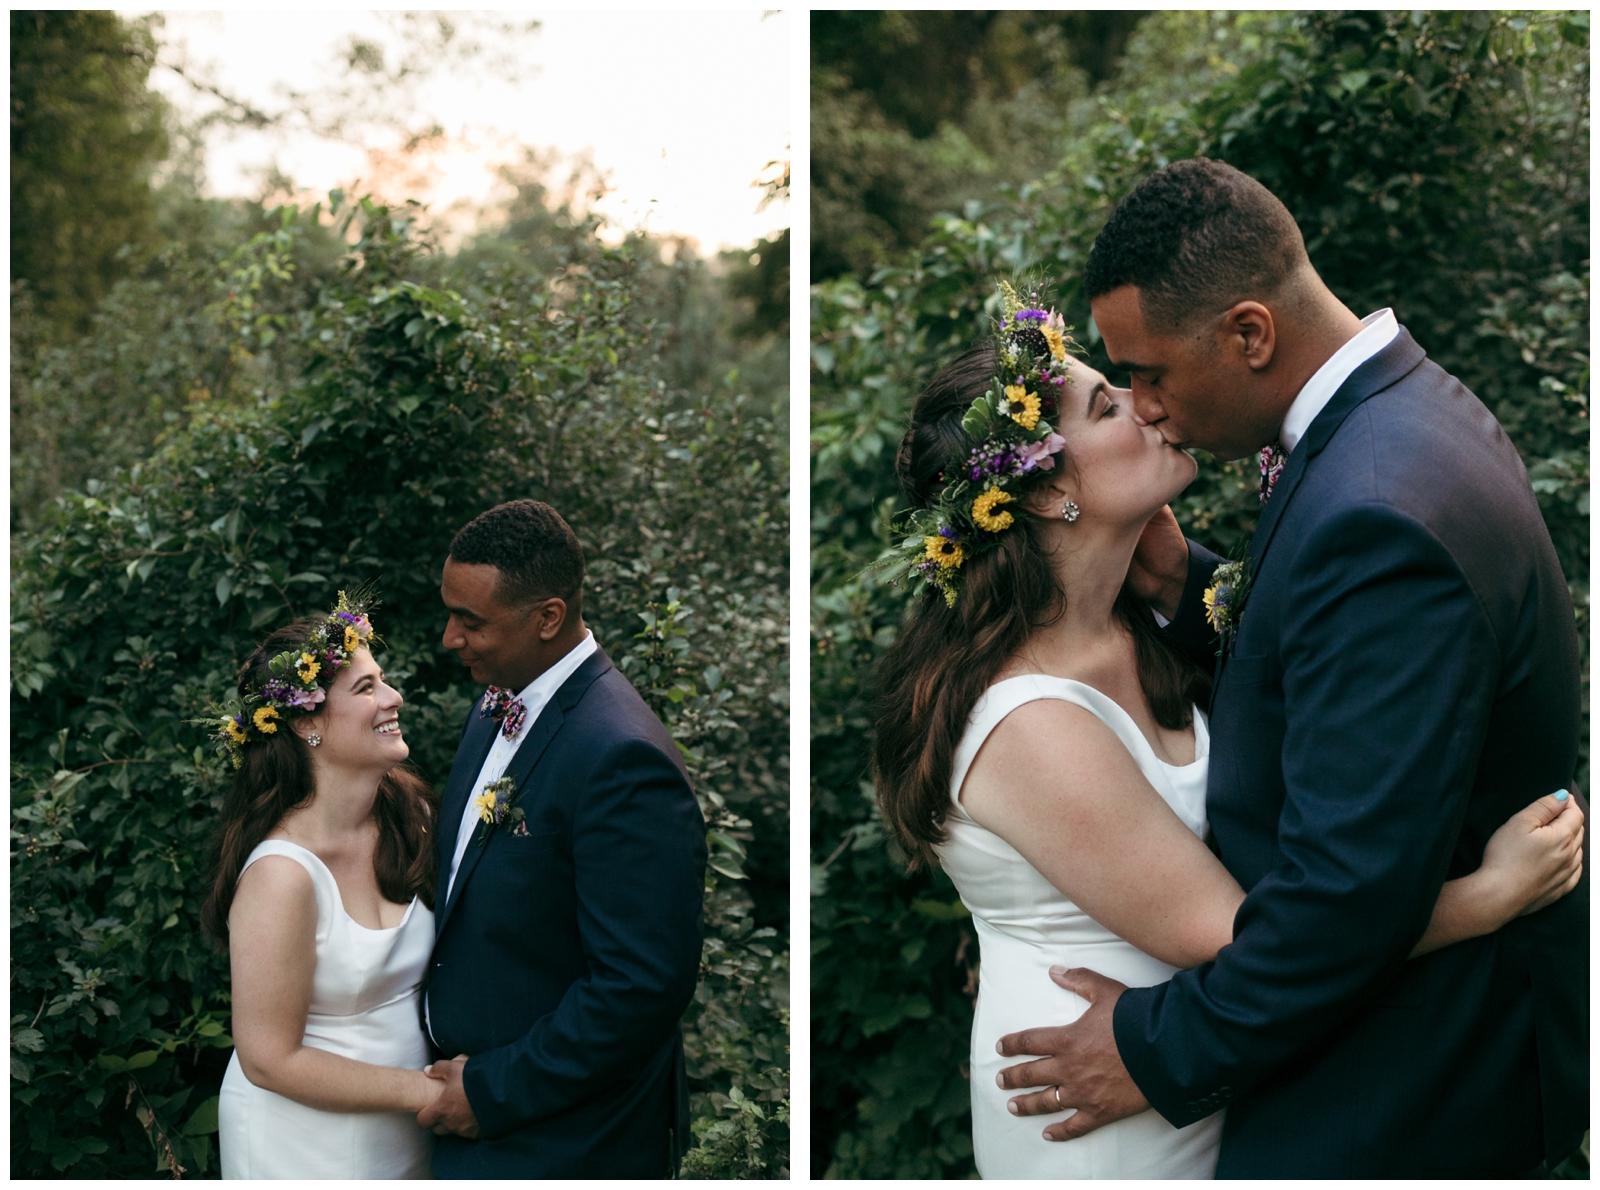 Bailey-Q-Photo-Connors-Center-Wedding-Boston-Wedding-Photographer-101.jpg